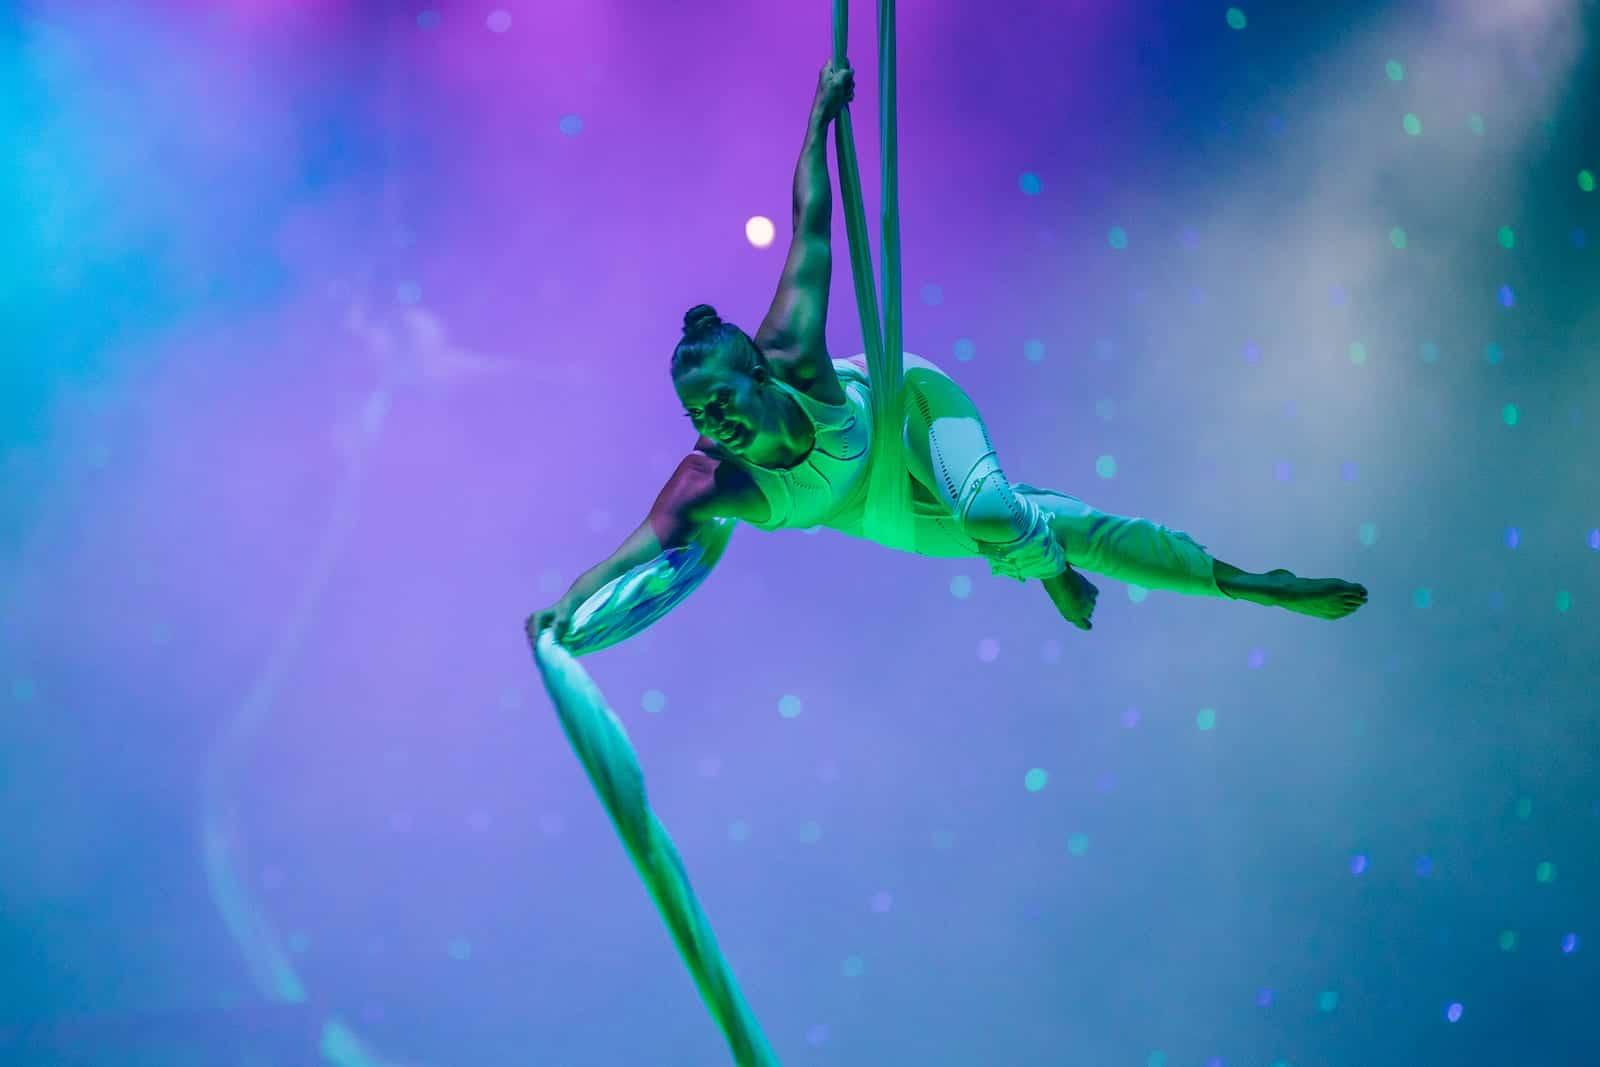 Julia flying lady creativiva trapeze